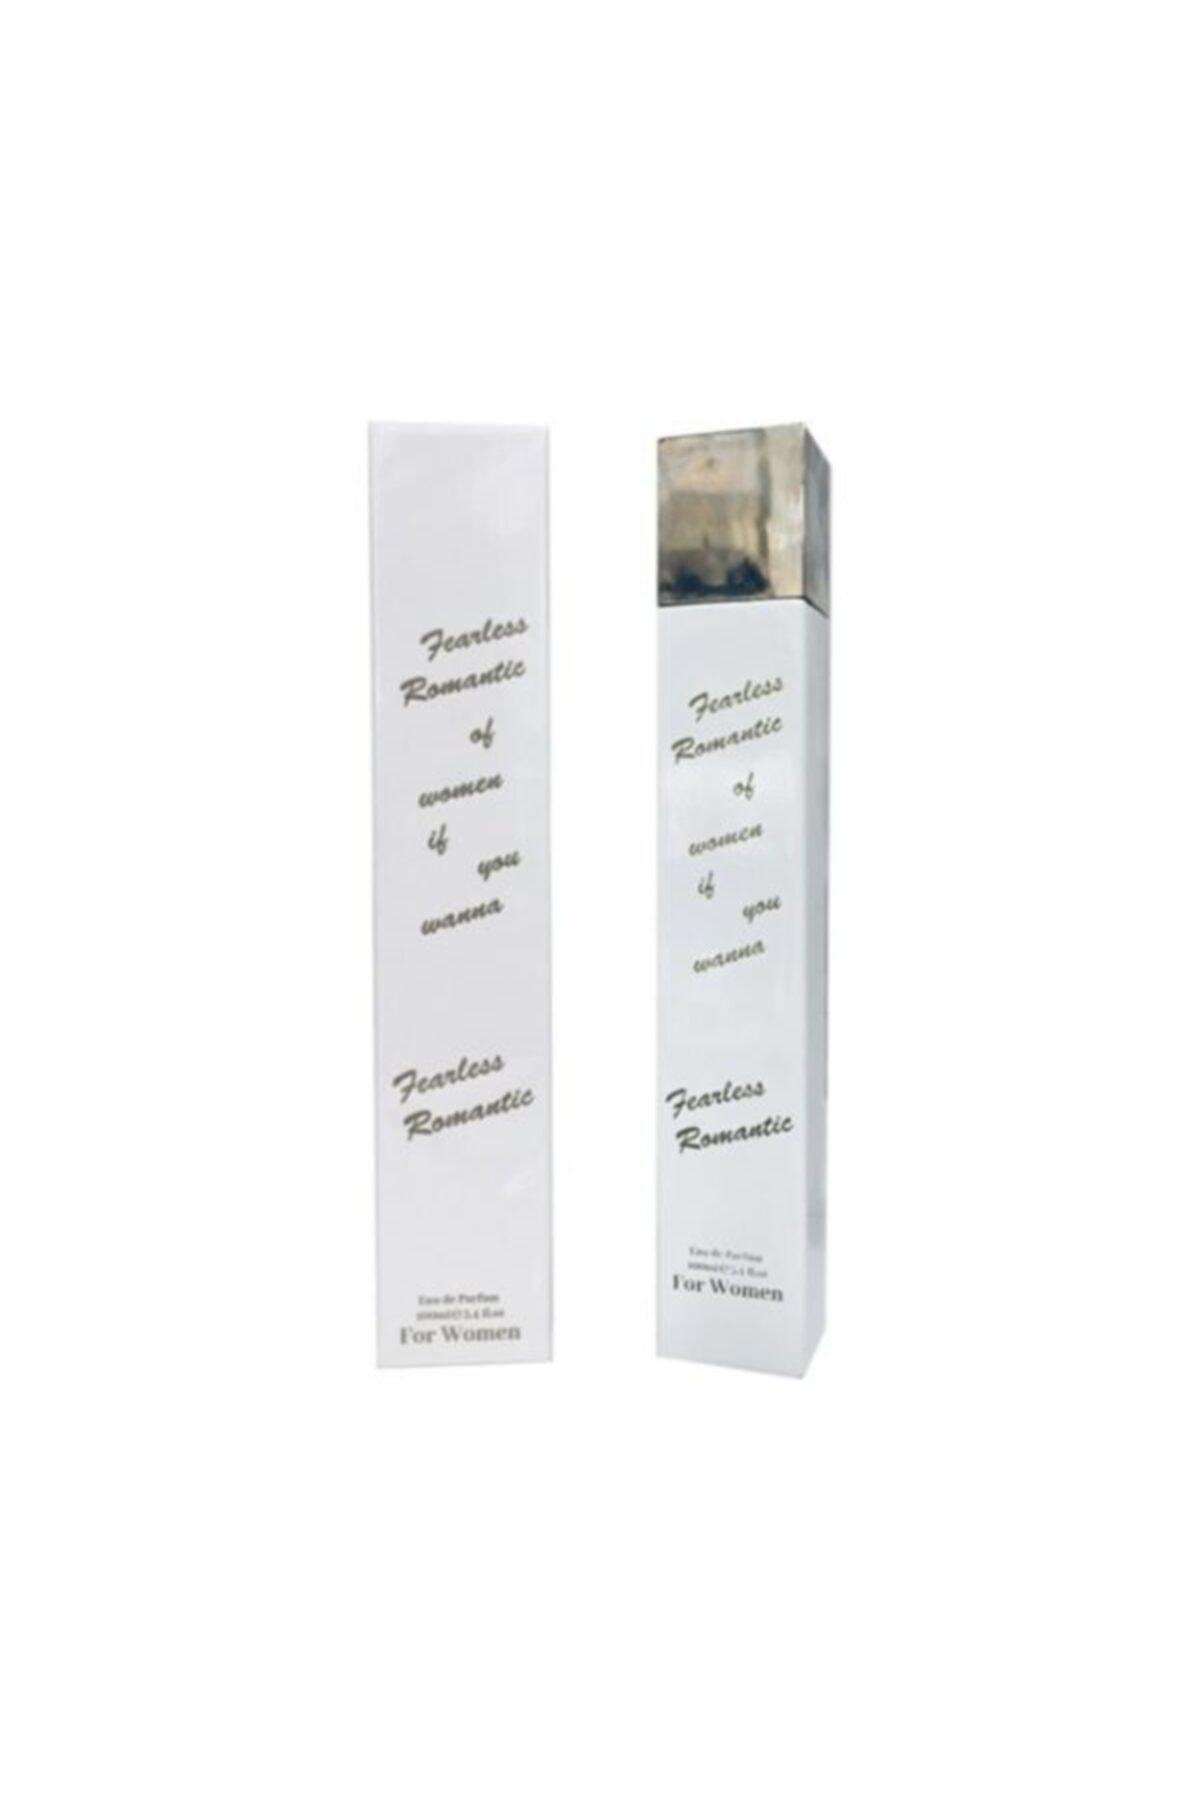 Collezione Fearless Romantic Edp 100 ml Kadın Parfüm fs869feart8tr117 1